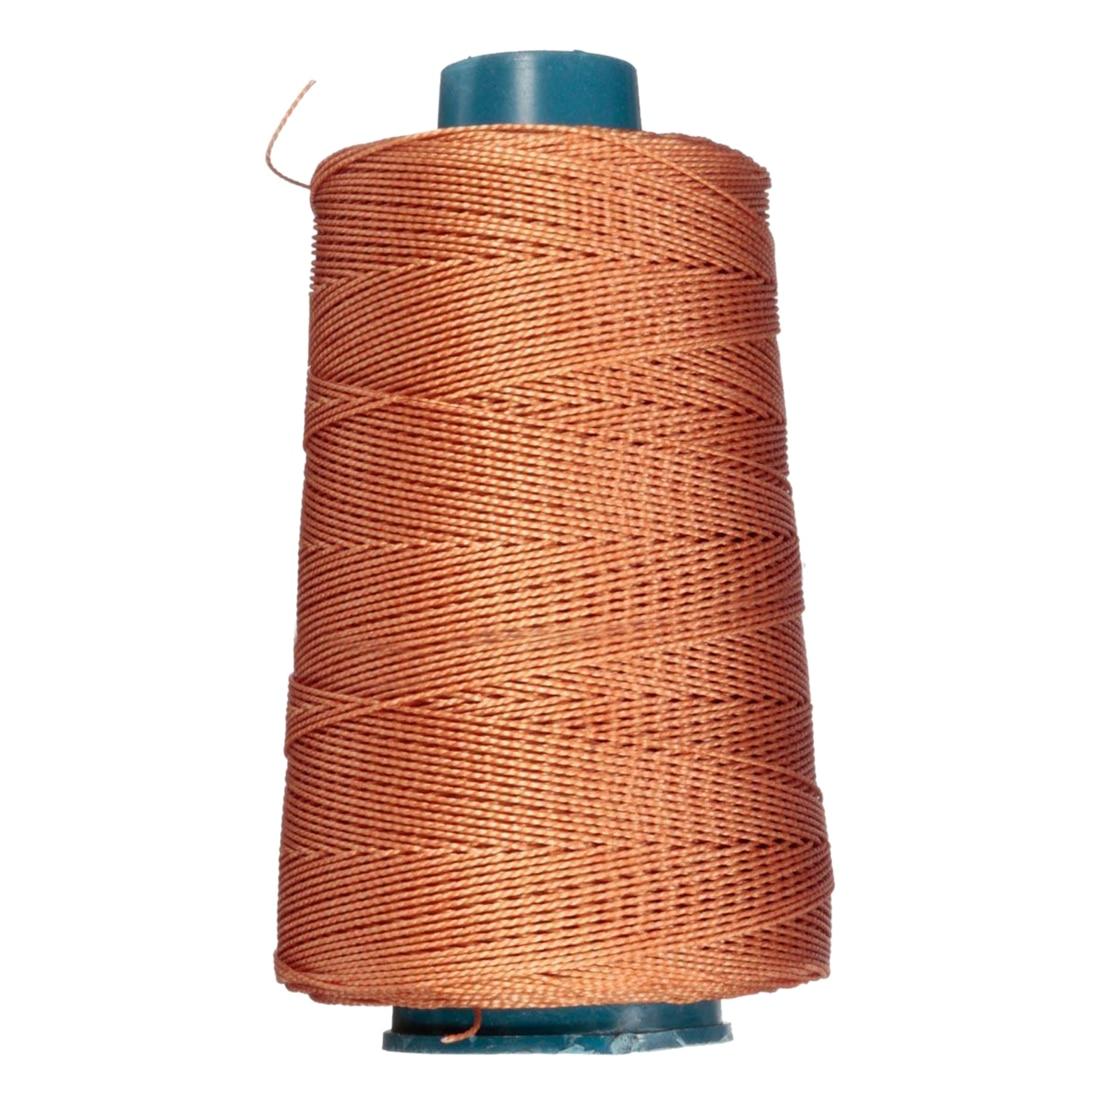 400m 80lbs Nylon Twisted Bowstring Thread Fishing String Sewing Cord Kite Line